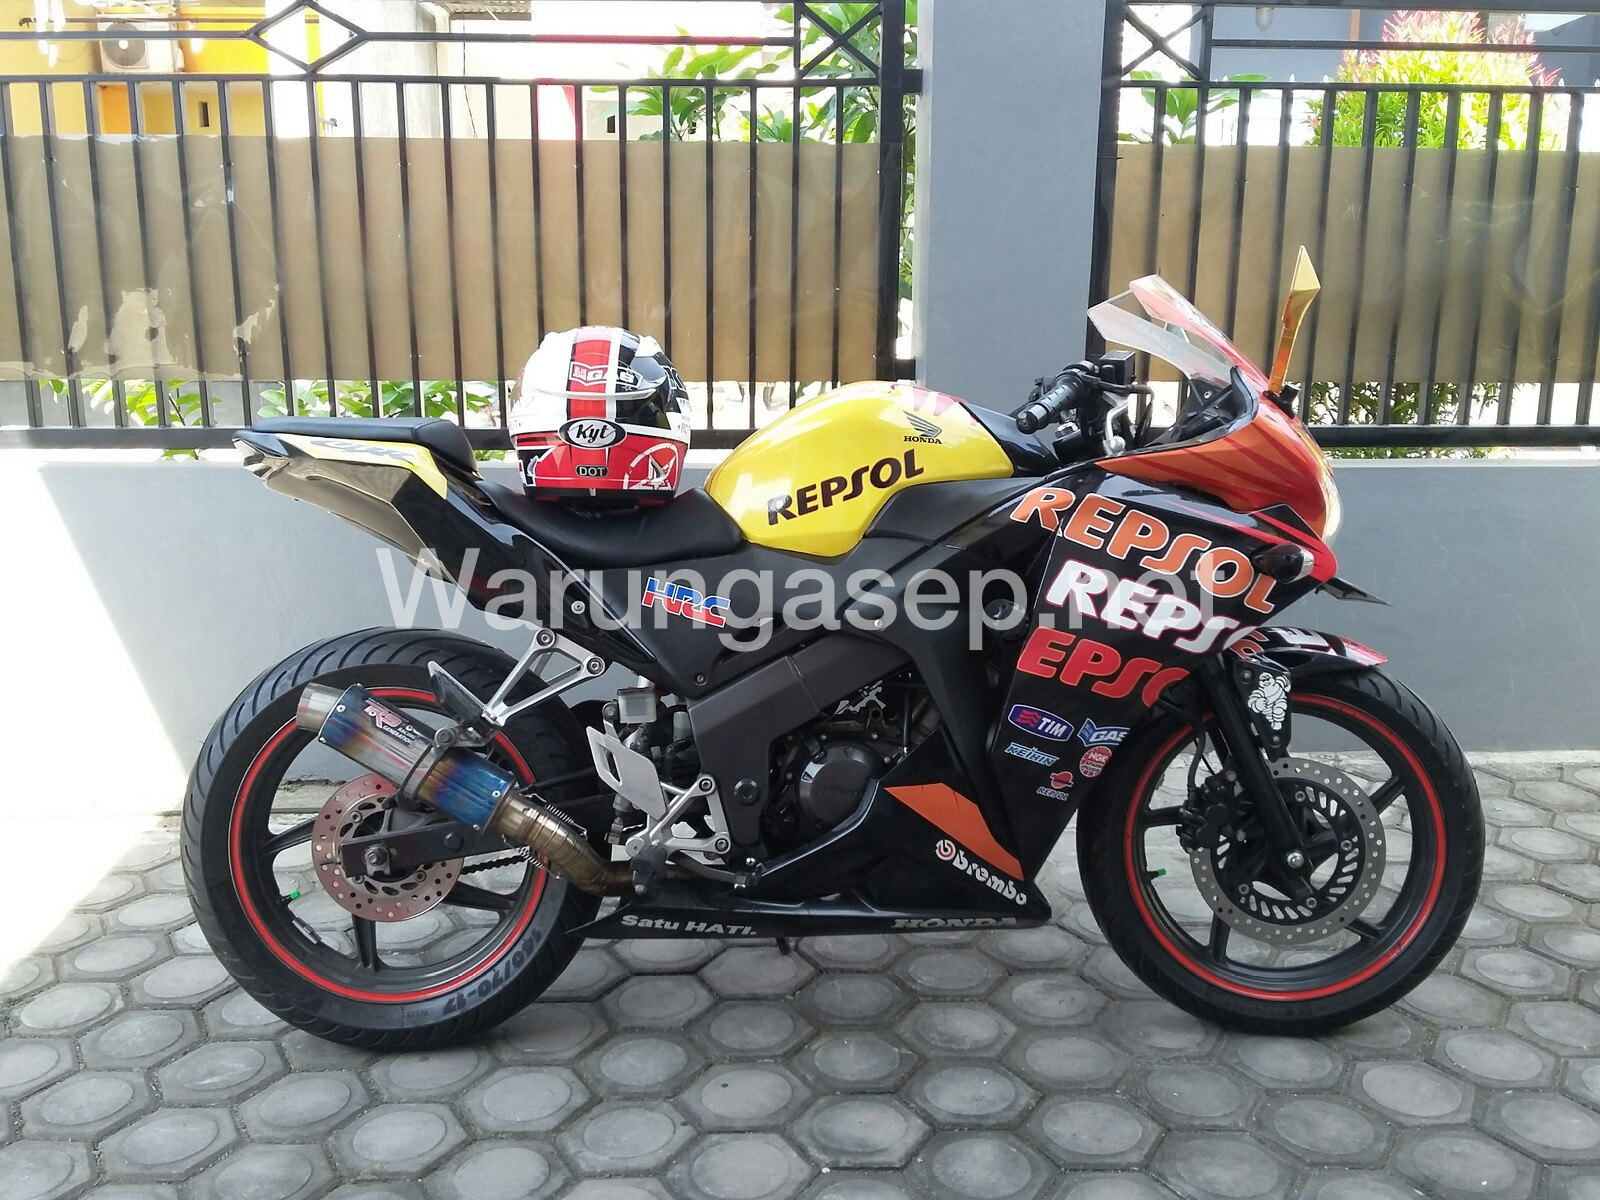 Modifikasi Honda Cbr150r Cbu 2012 Buntut Ala Ninja Topspeed 161km Jam Power 21hp Warungasep